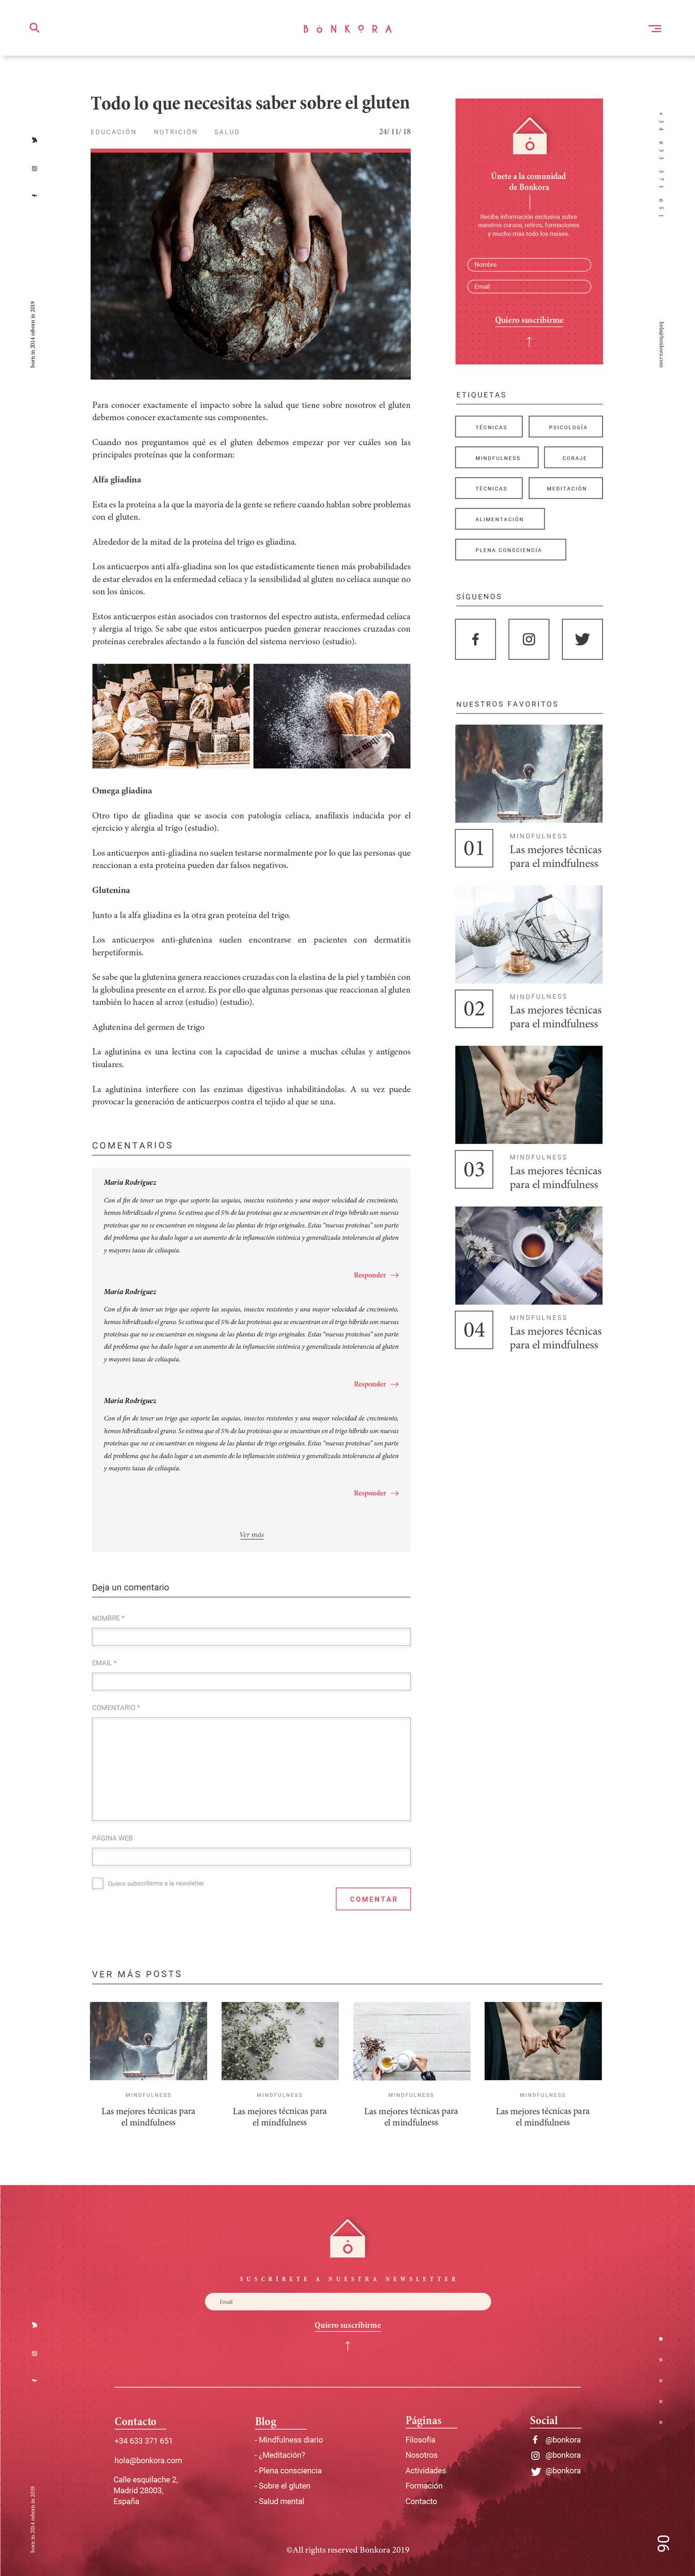 7.-Blog-Post.jpg